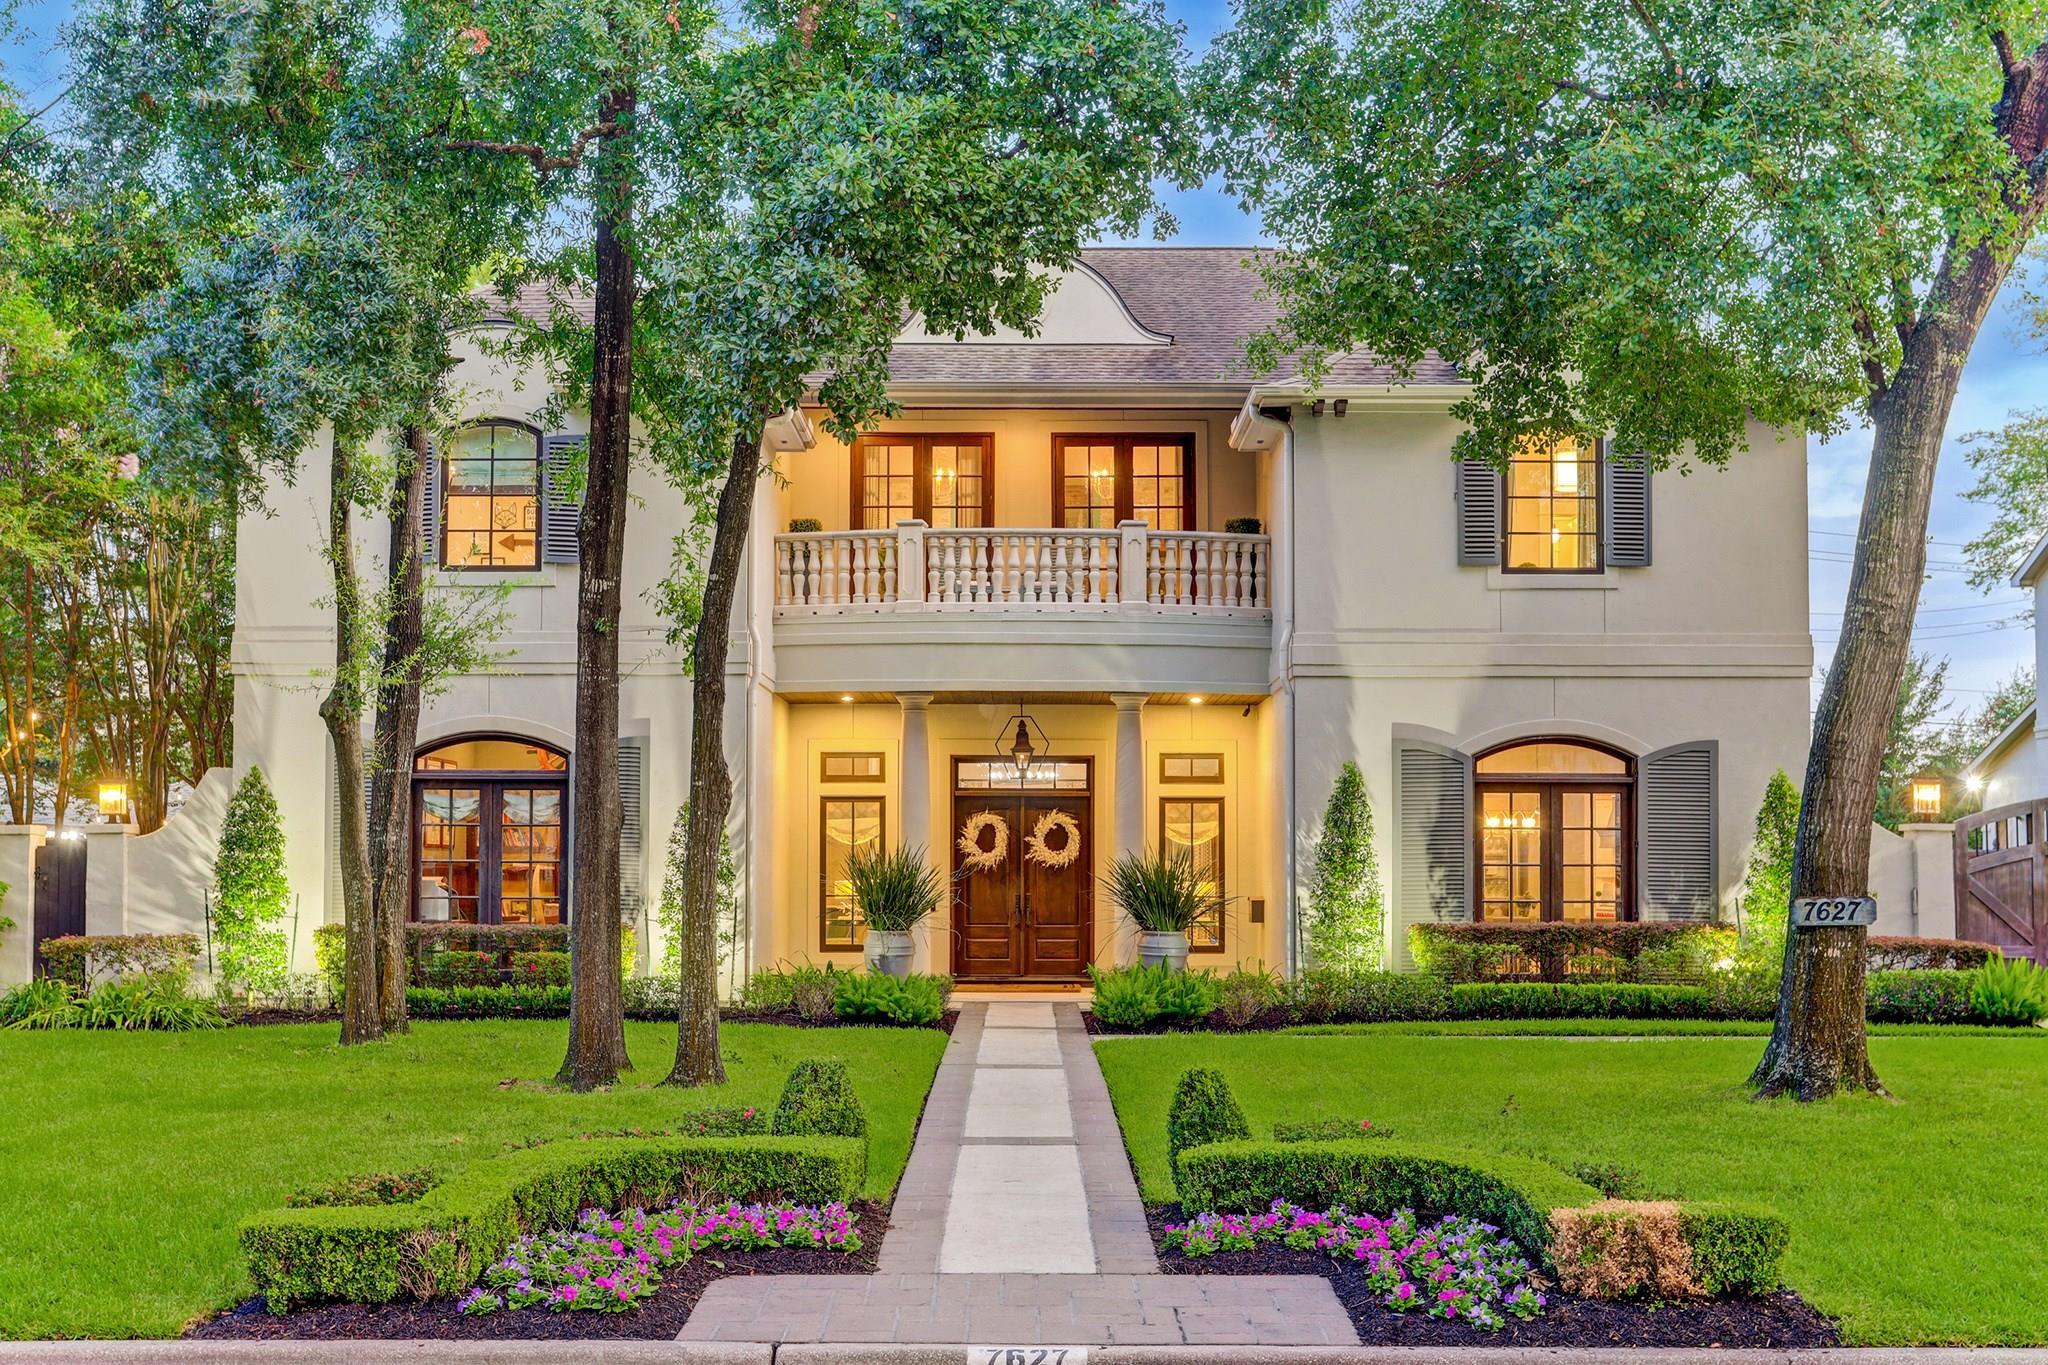 7627 Betty Jane Lane Property Photo - Houston, TX real estate listing